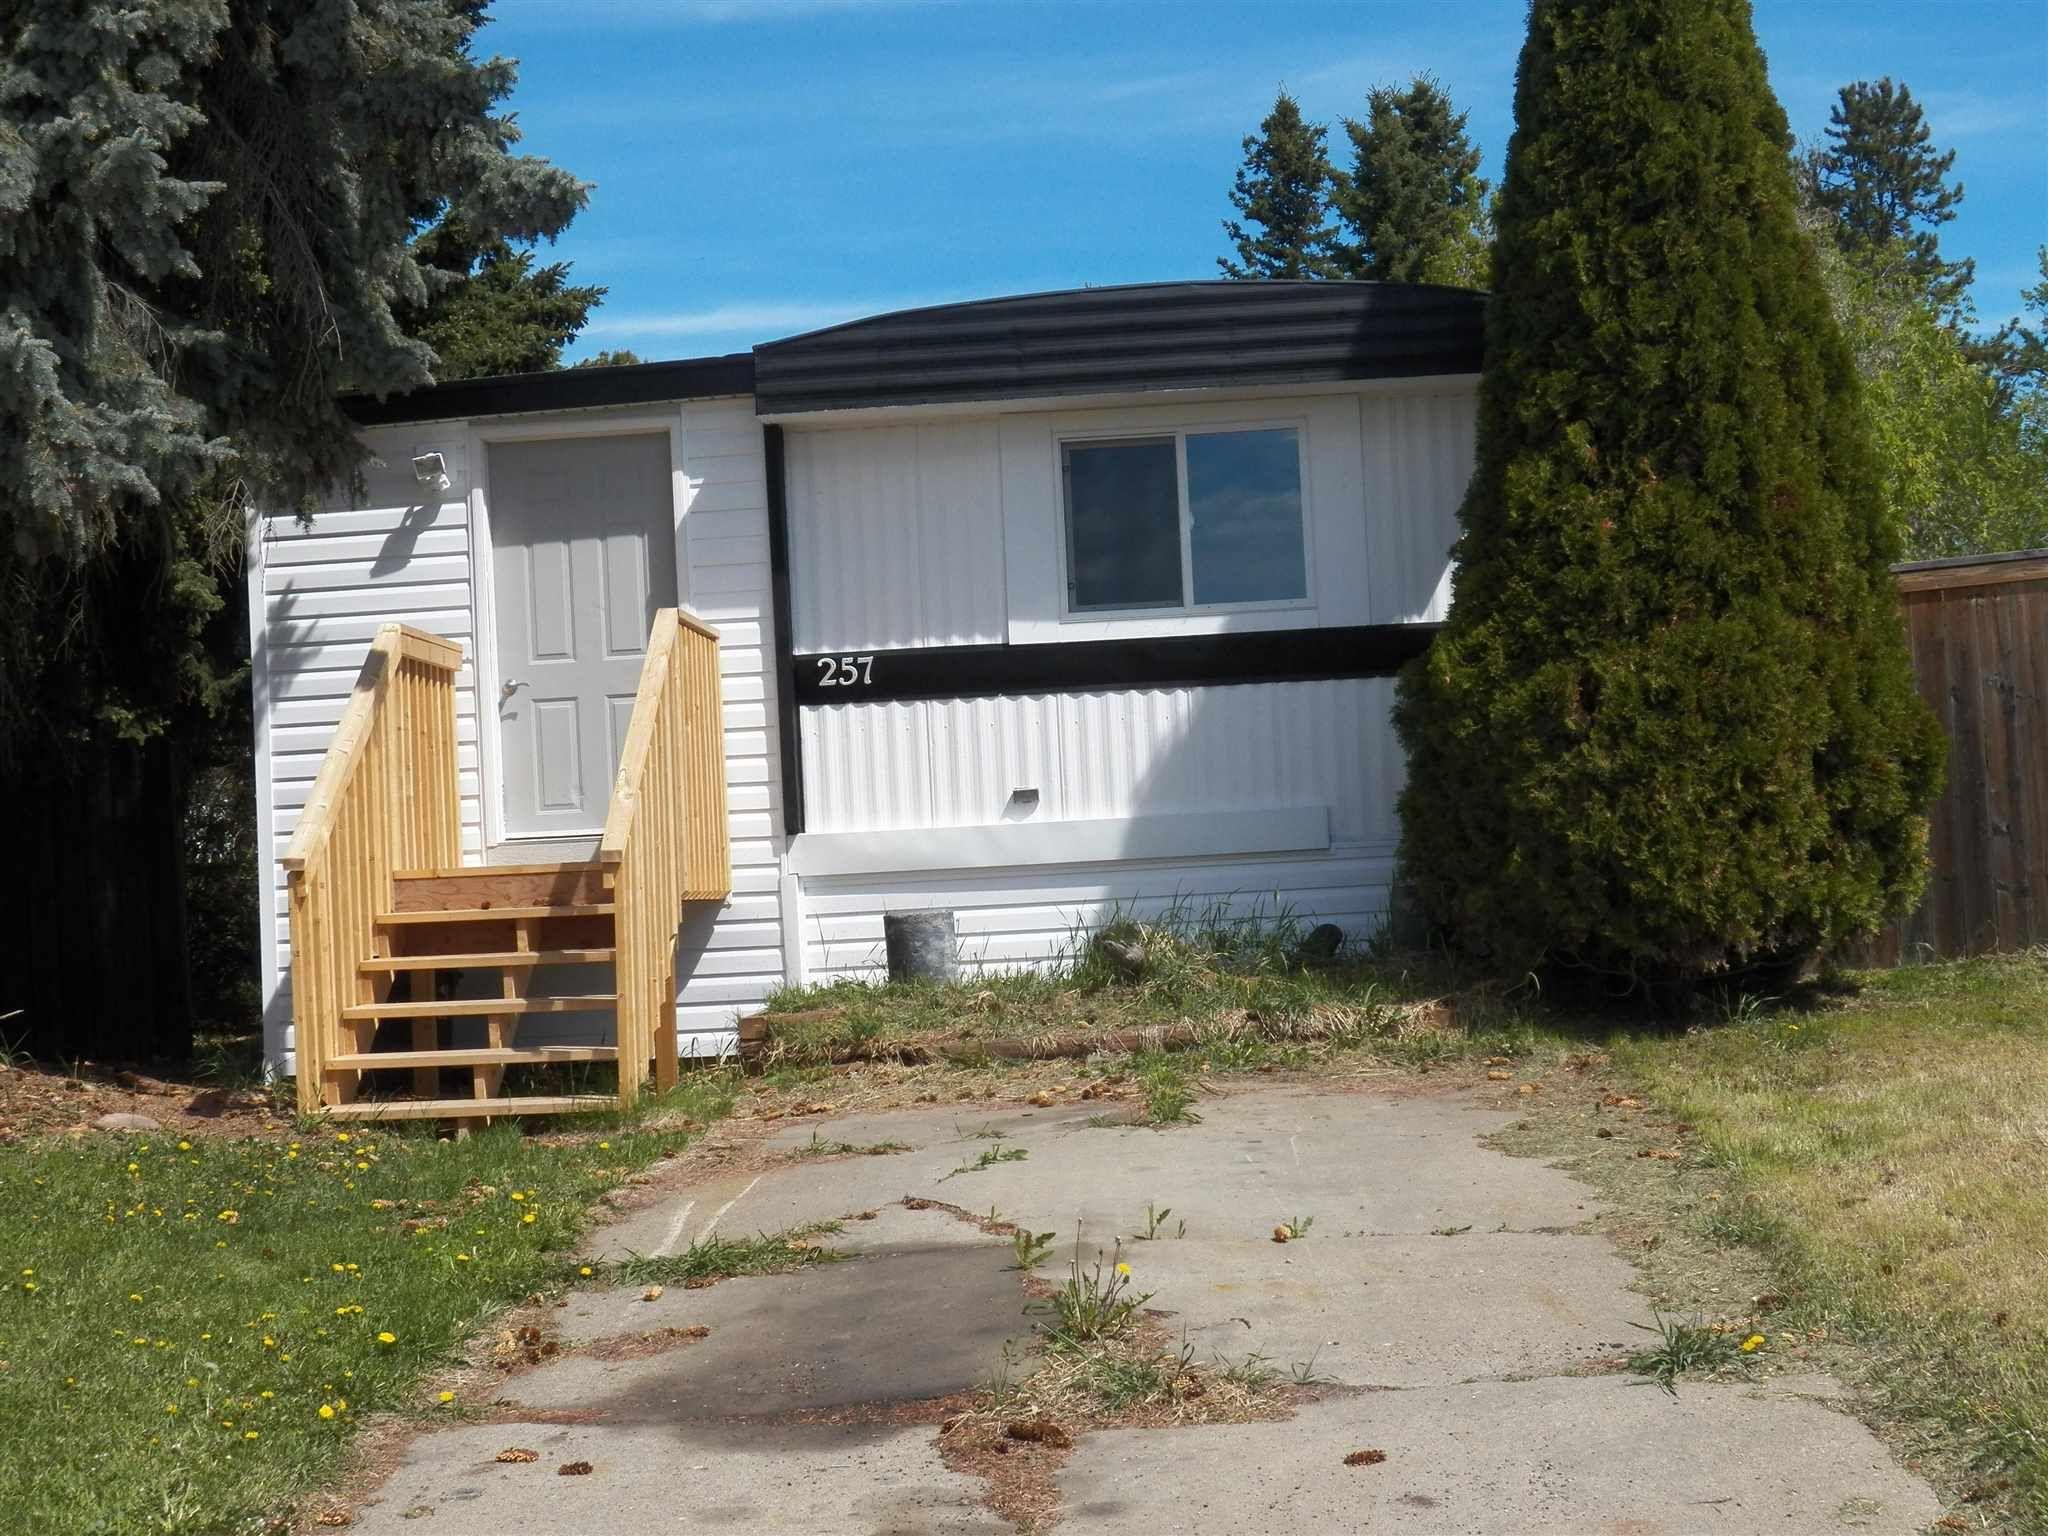 Main Photo: 257 LEE_RIDGE Road NW in Edmonton: Zone 29 House for sale : MLS®# E4248957